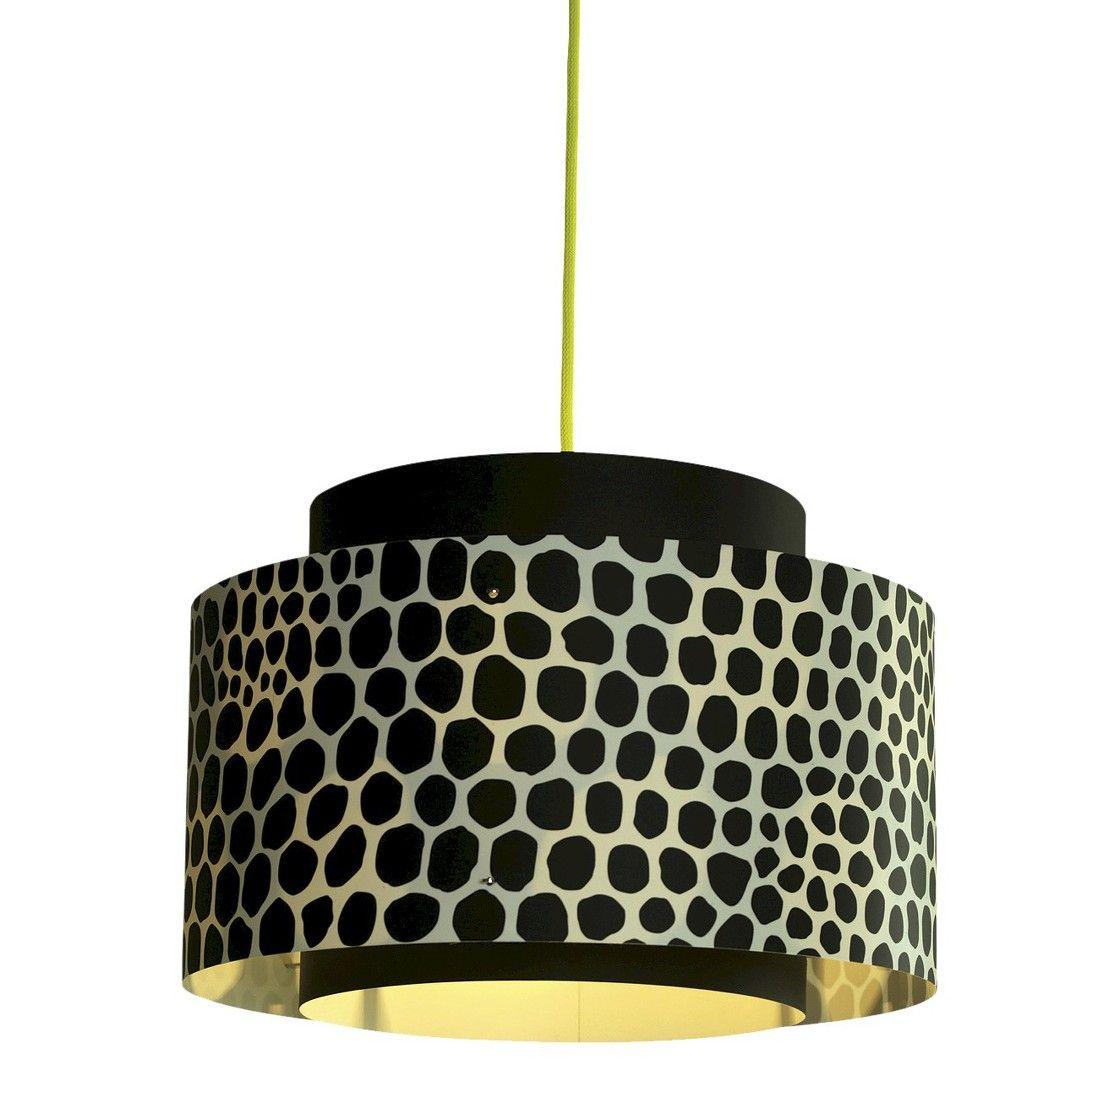 Venlo plugin pendant black with yellow cord homie stuff